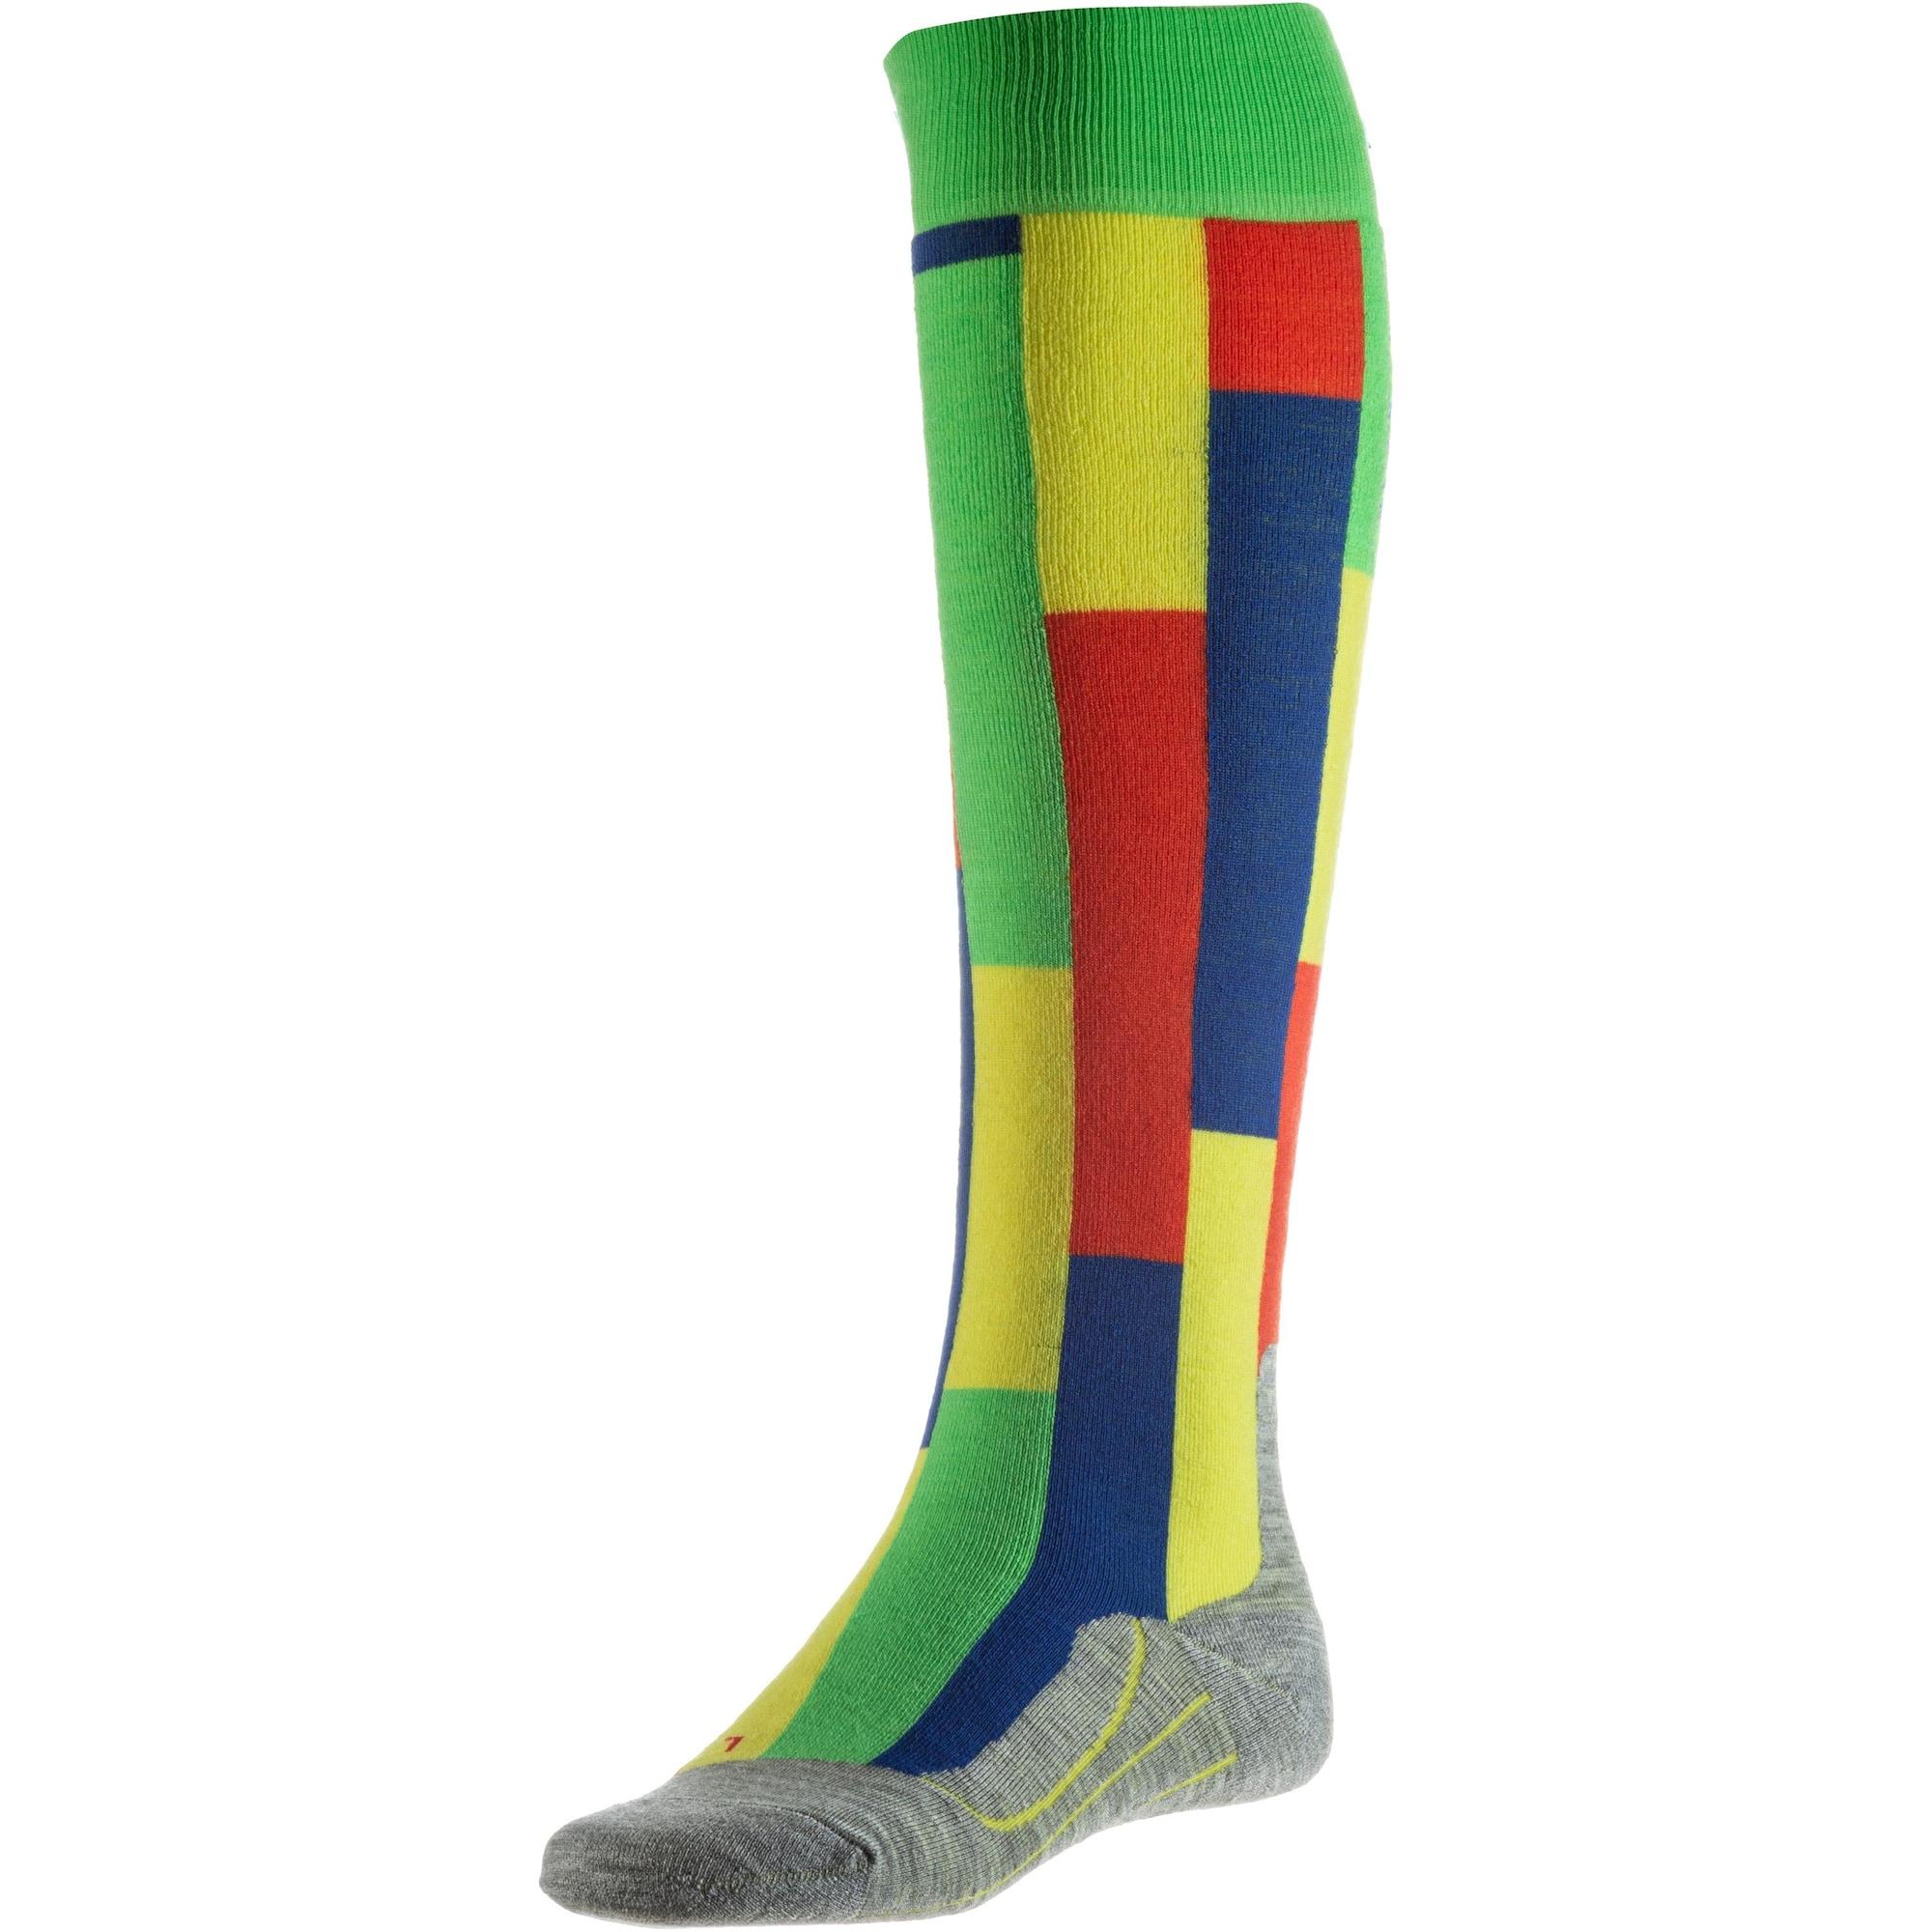 Skisocken 'SK4 Brick'   Sportbekleidung > Funktionswäsche > Skisocken   Falke